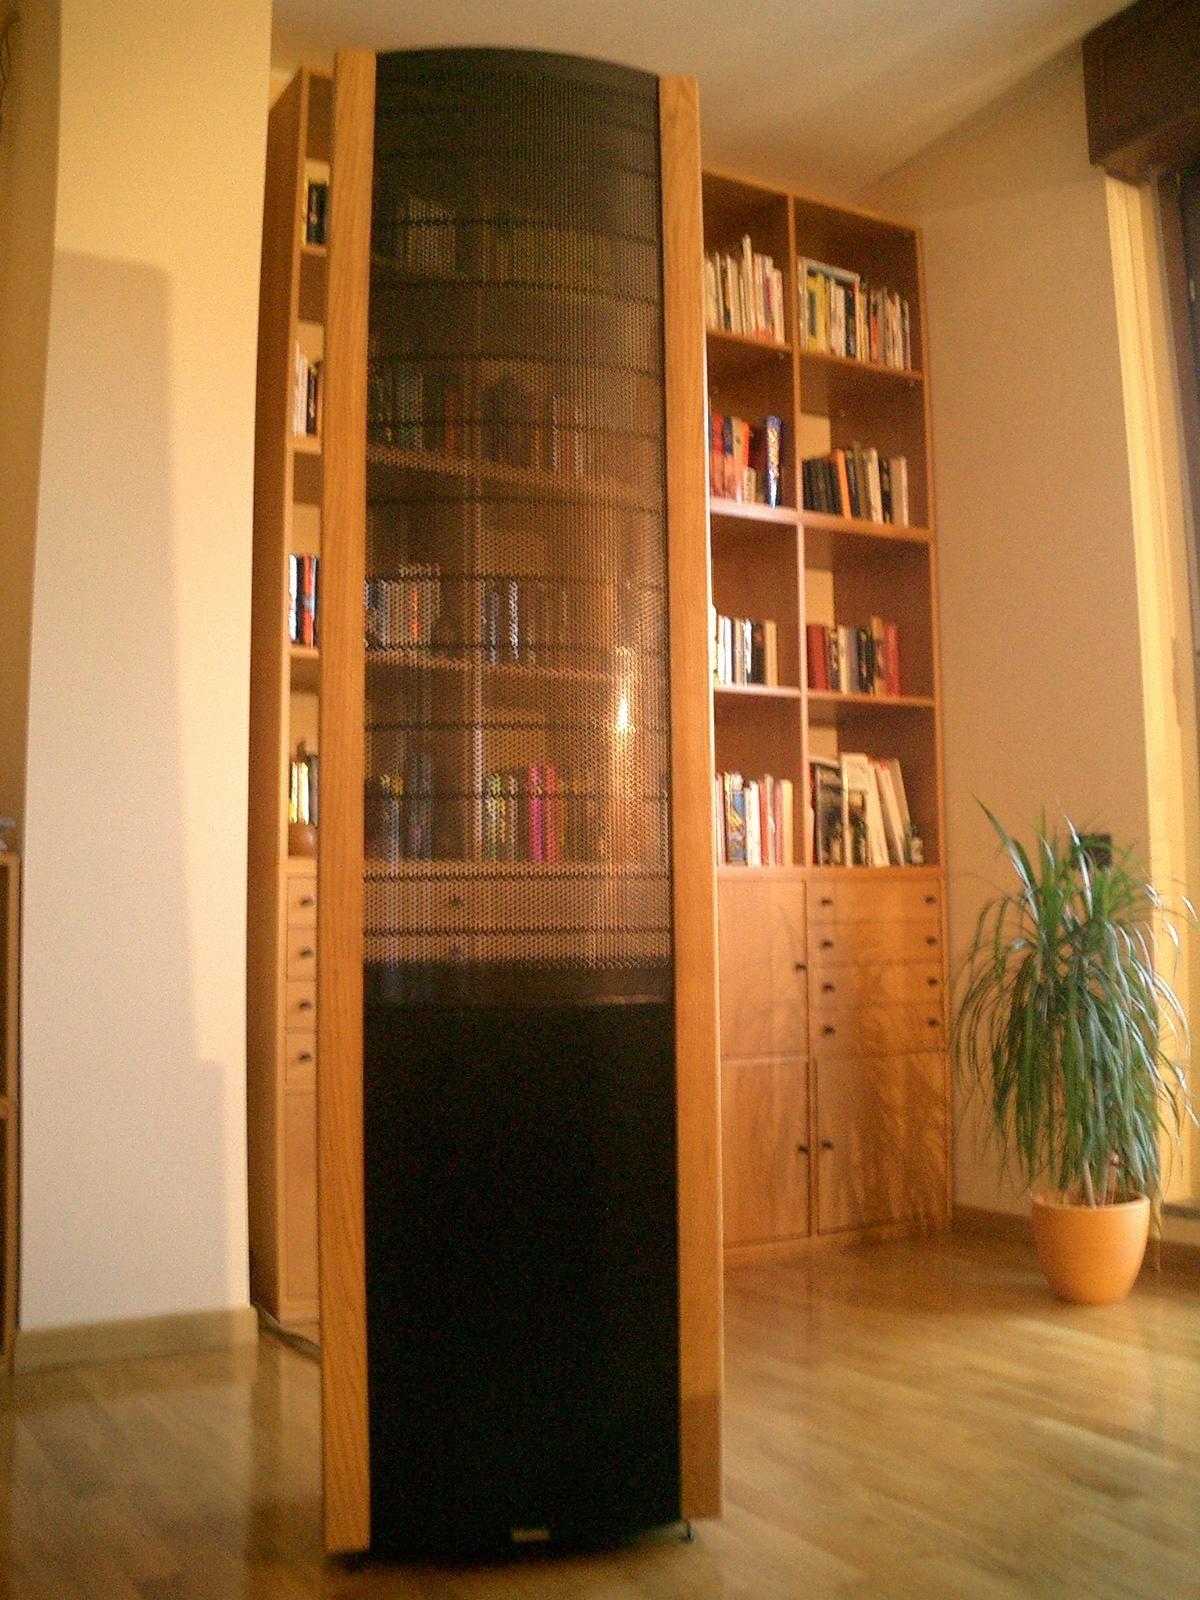 speakers paradigm logan reference watch studio subwoofer v display demo martin bookshelf